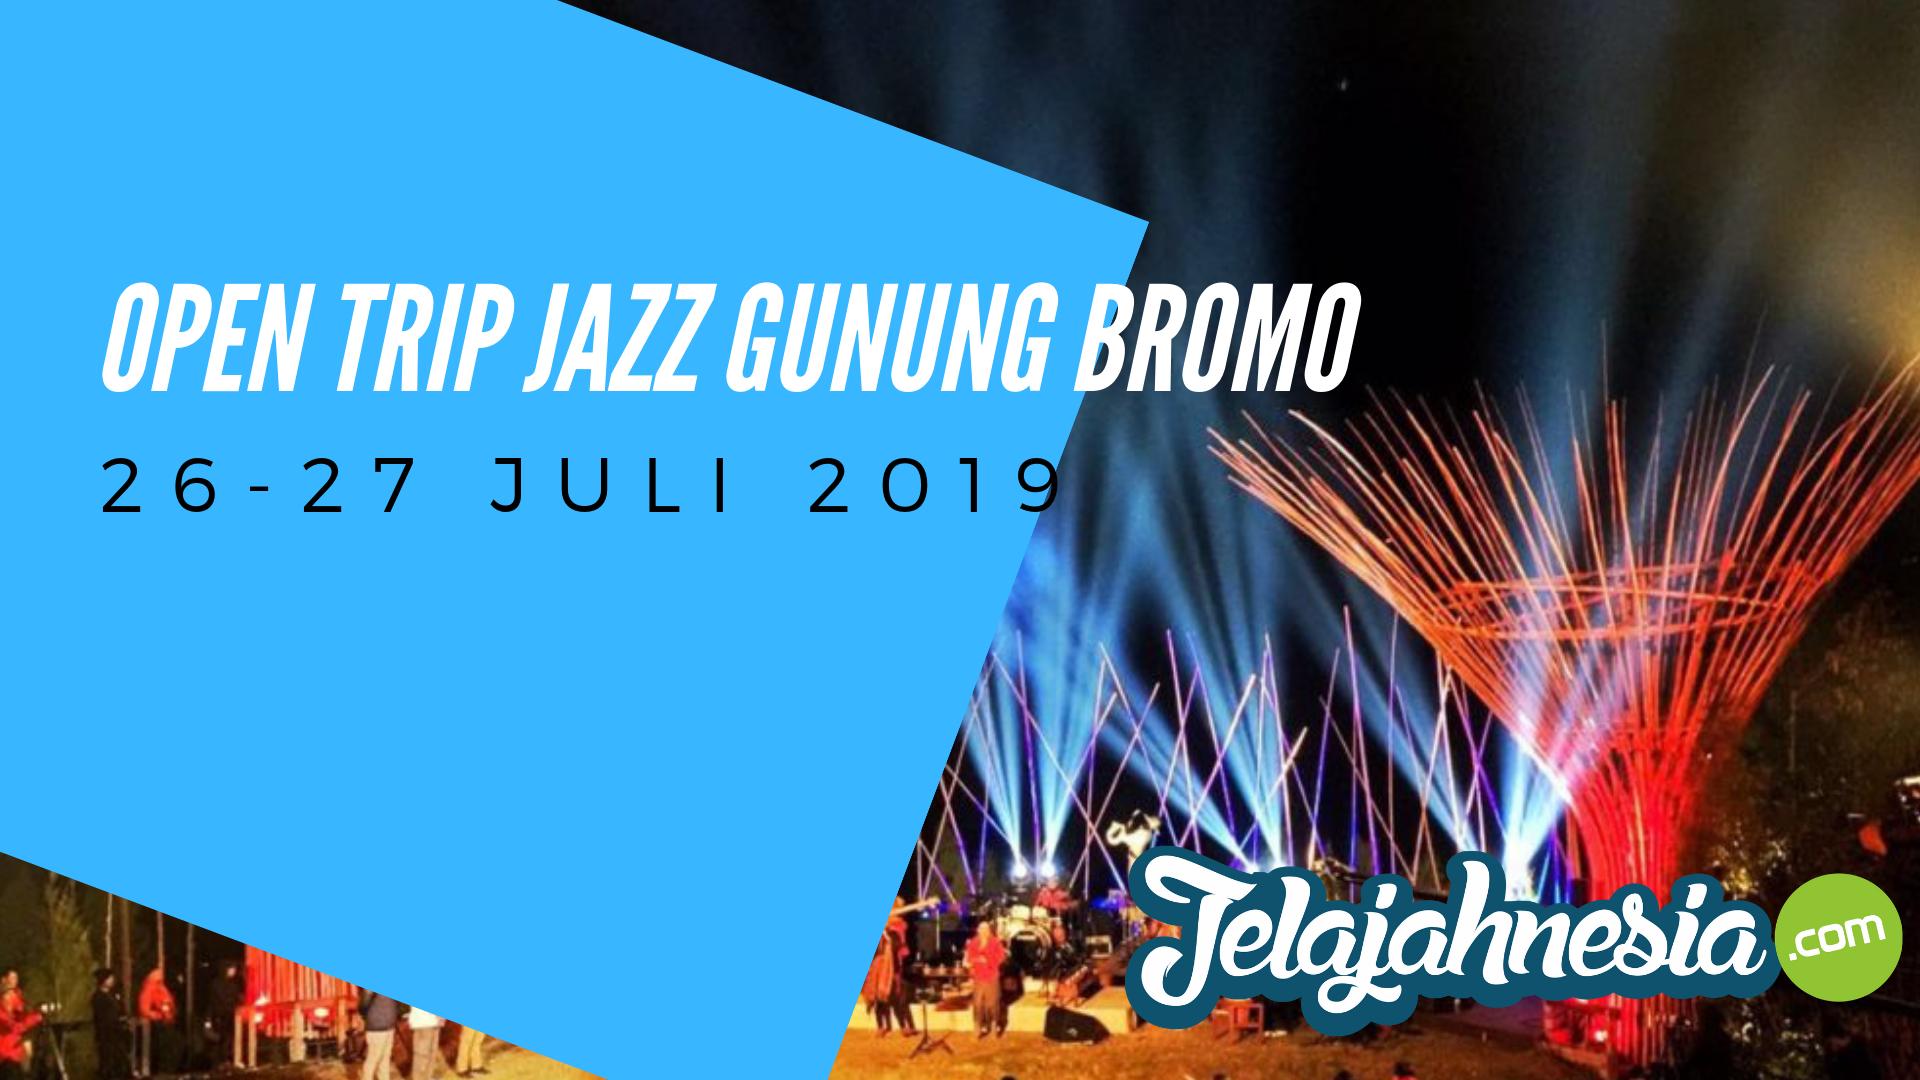 Open Trip Jazz Gunung Bromo 26 27 Juli 2019 Jelajahnesia Com